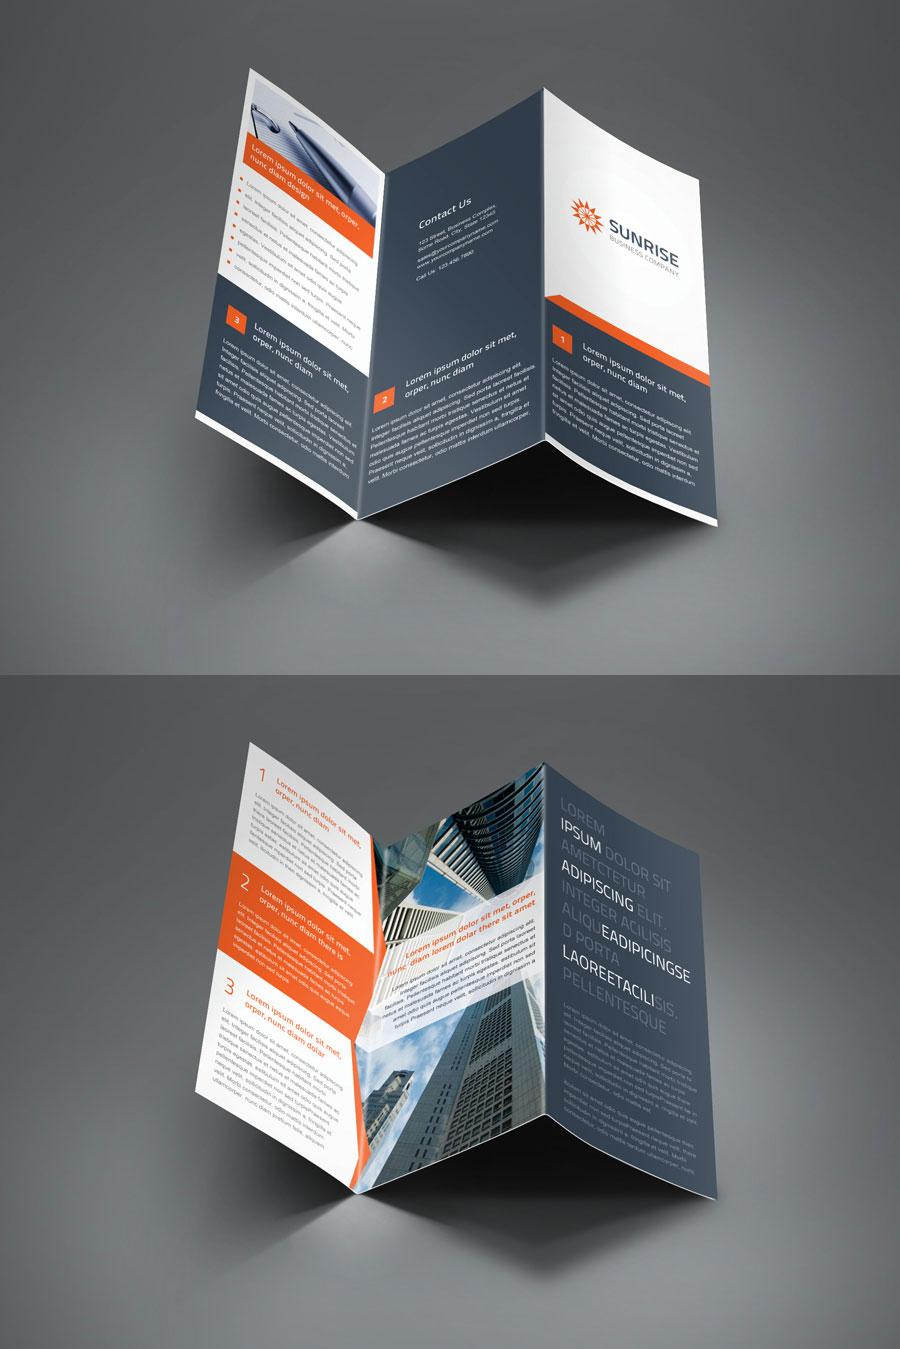 sunrise corporate trifold and z fold brochure by saptarang. Black Bedroom Furniture Sets. Home Design Ideas